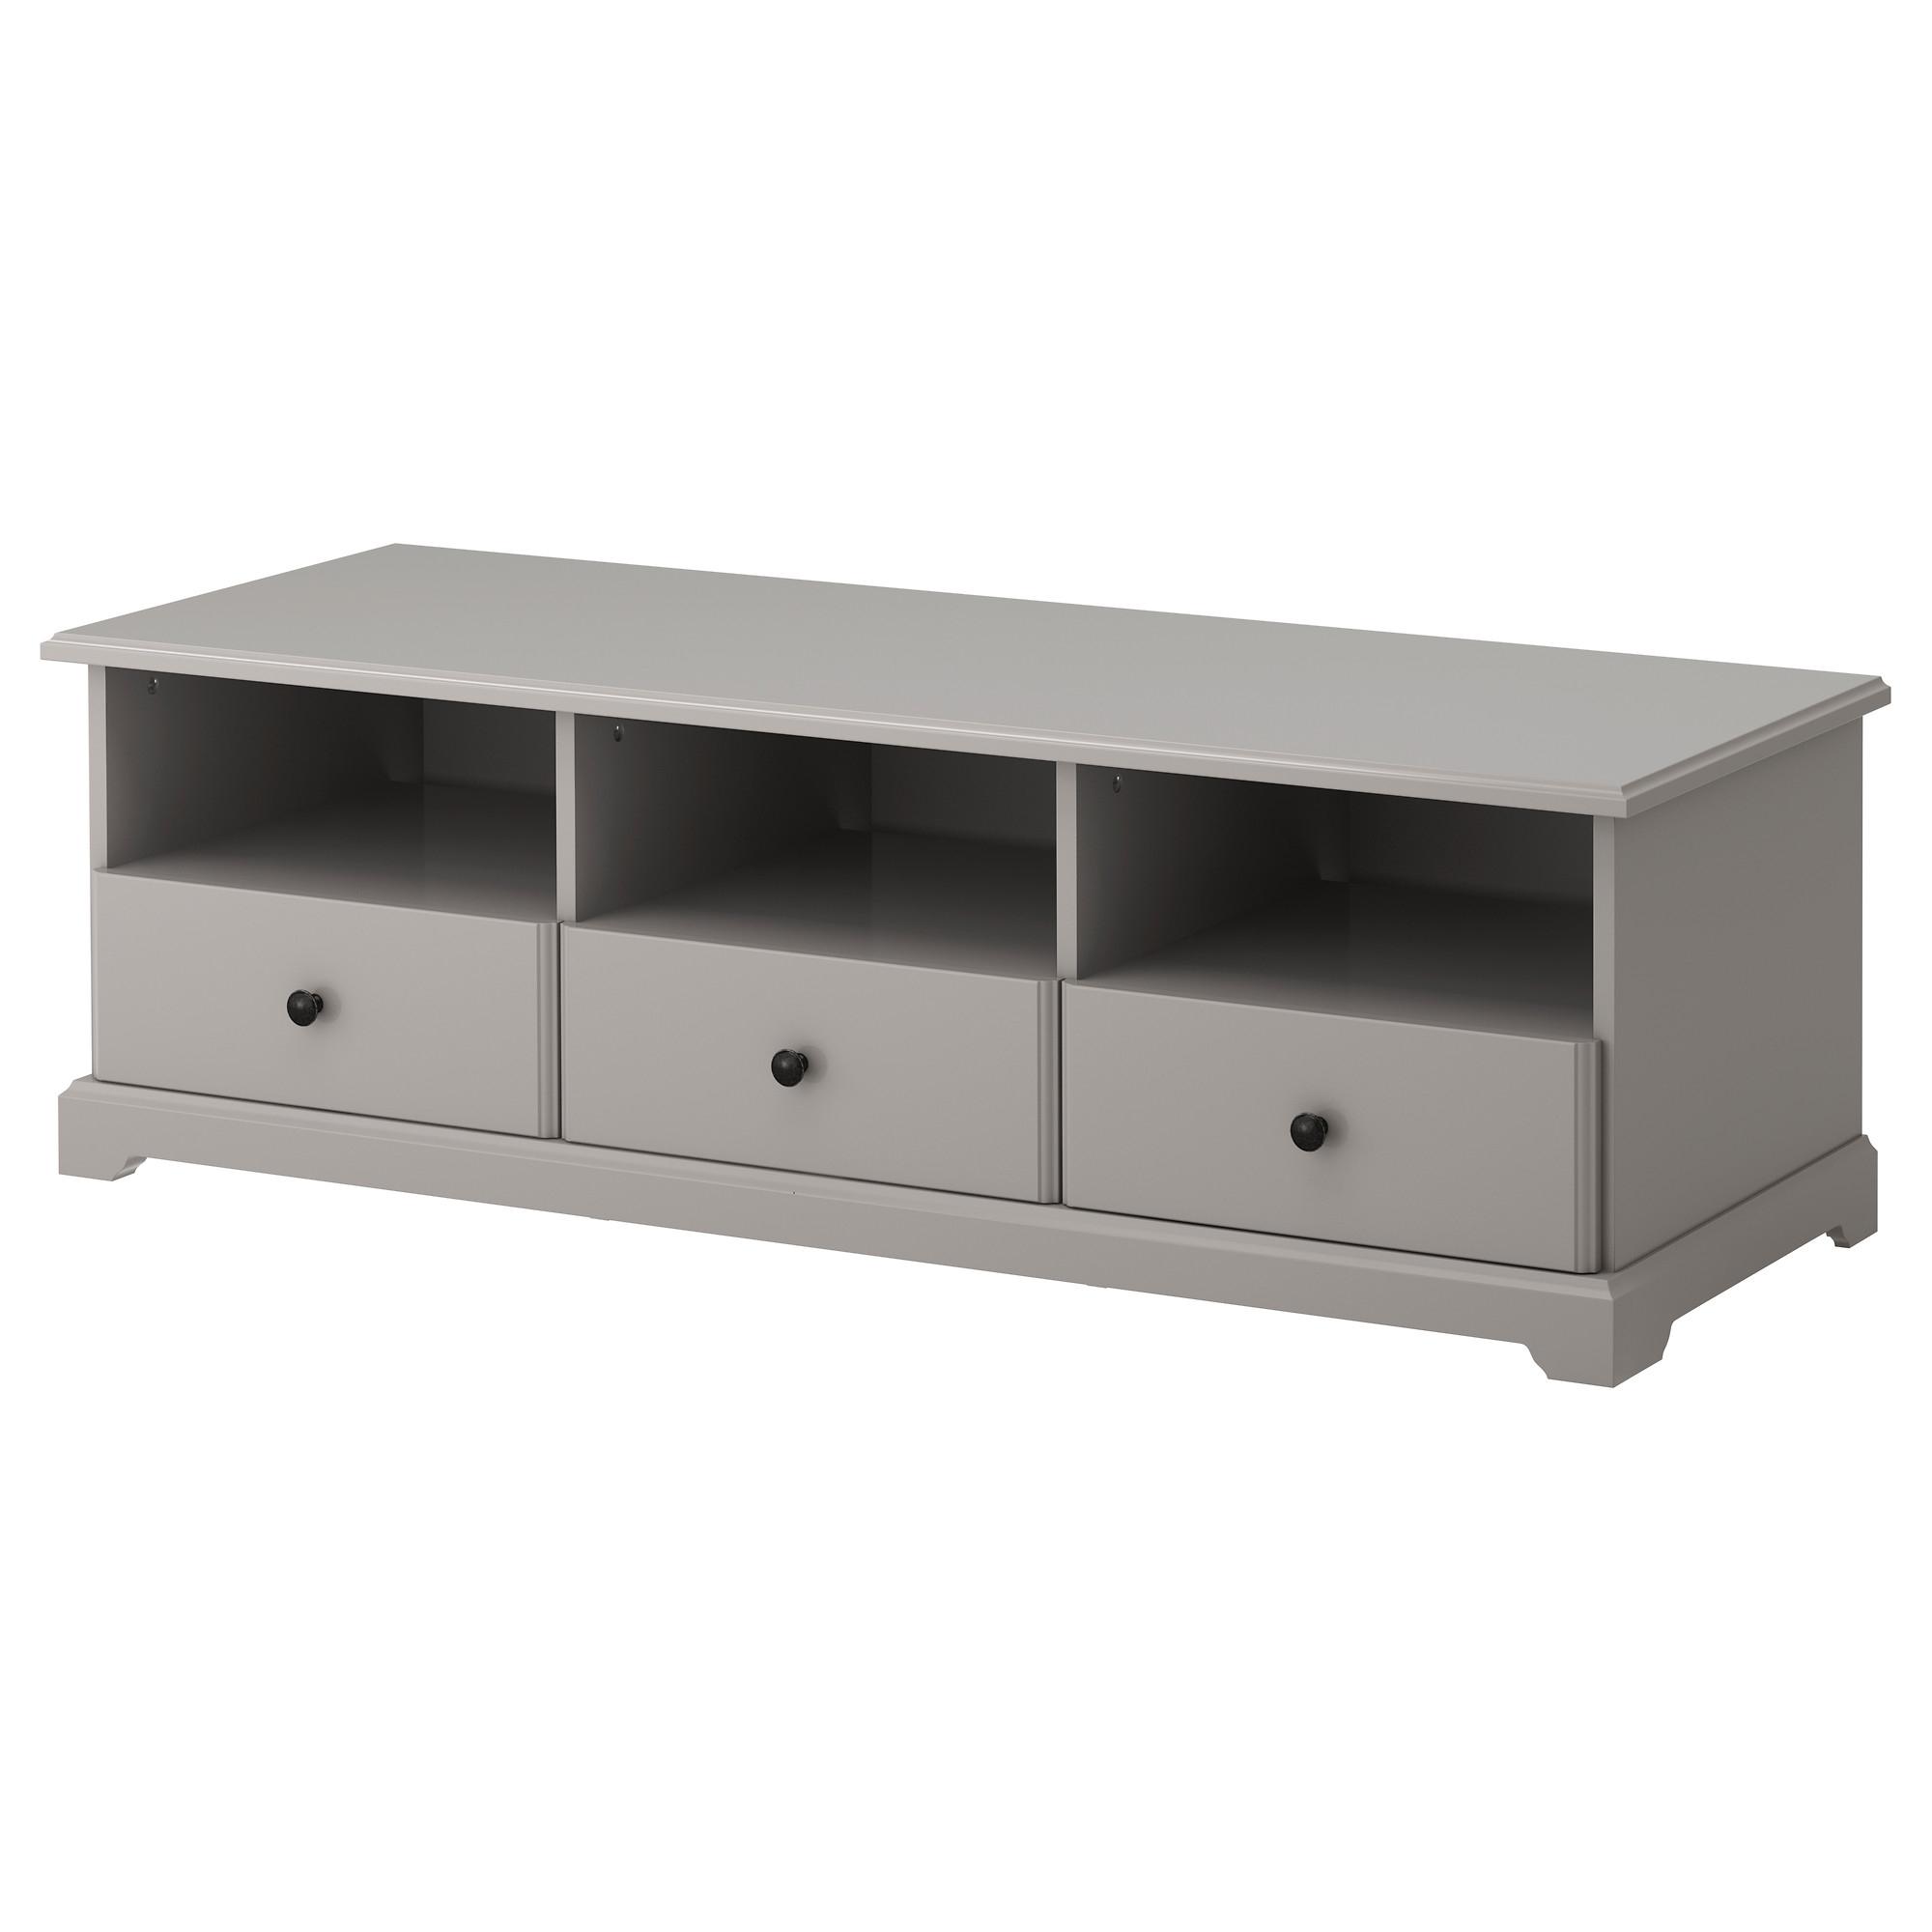 Benno Tv Meubel Ikea.Ikea Tv Cabinet Samyysandra Com